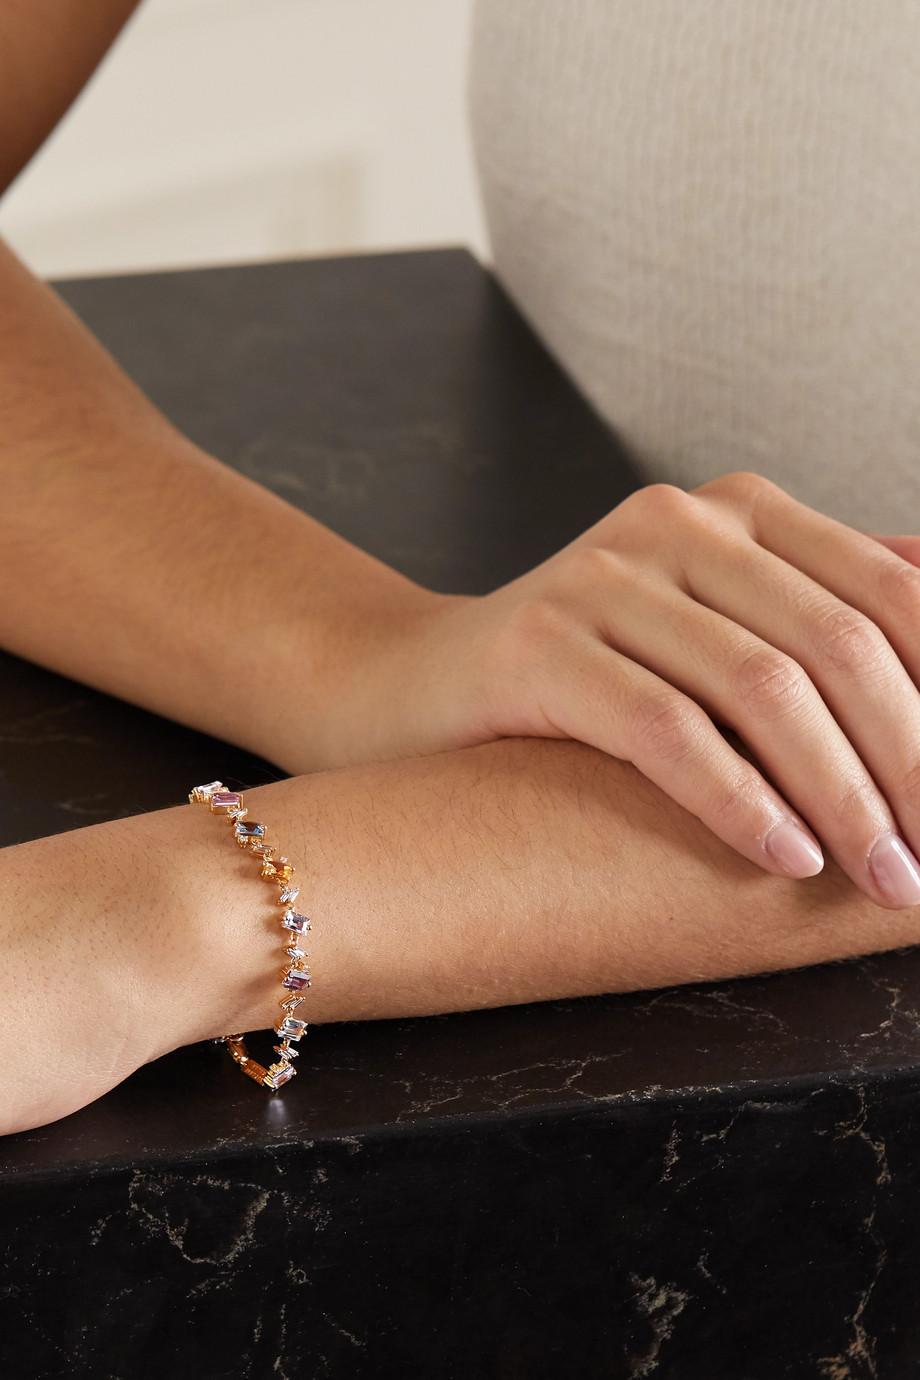 Suzanne Kalan 18-karat gold, sapphire and diamond tennis bracelet